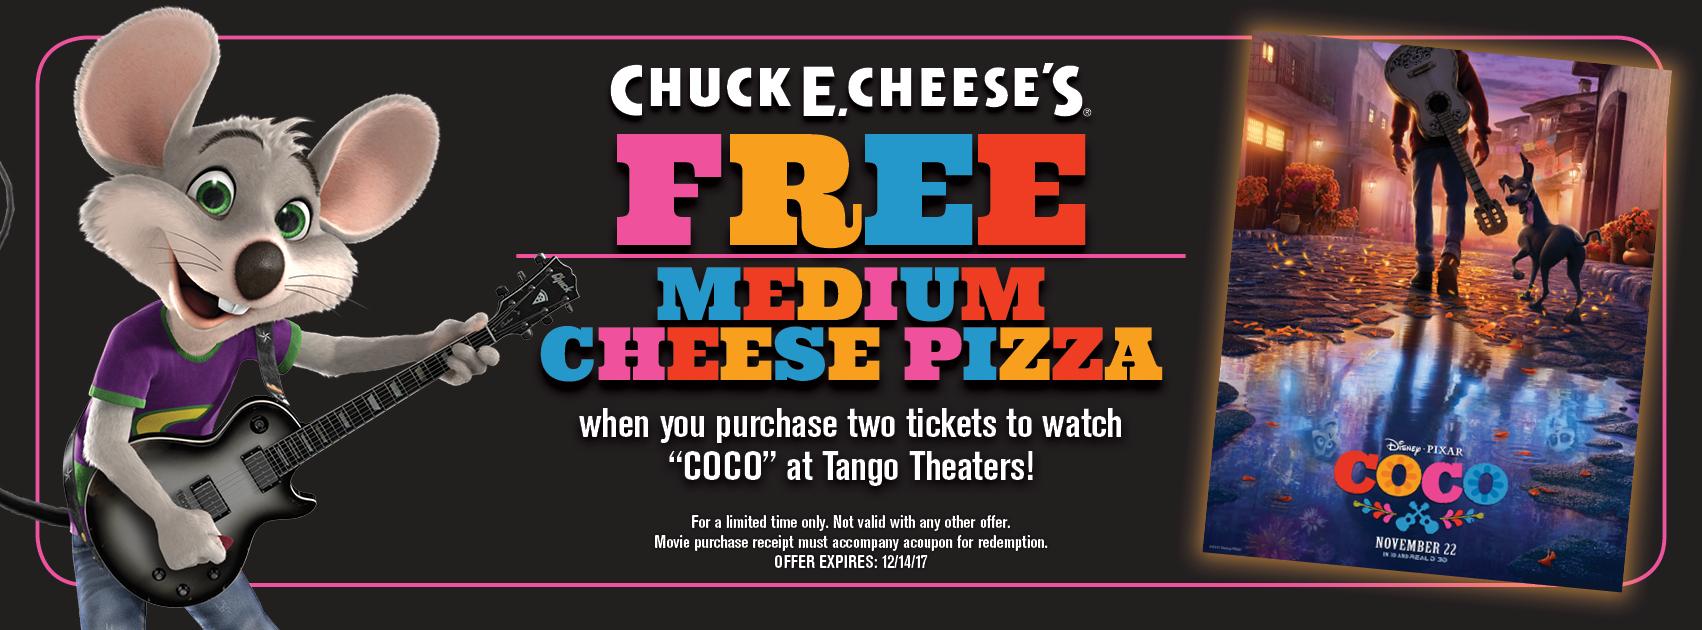 Chuck E. Cheese's Free Medium Cheese Pizza CoCo